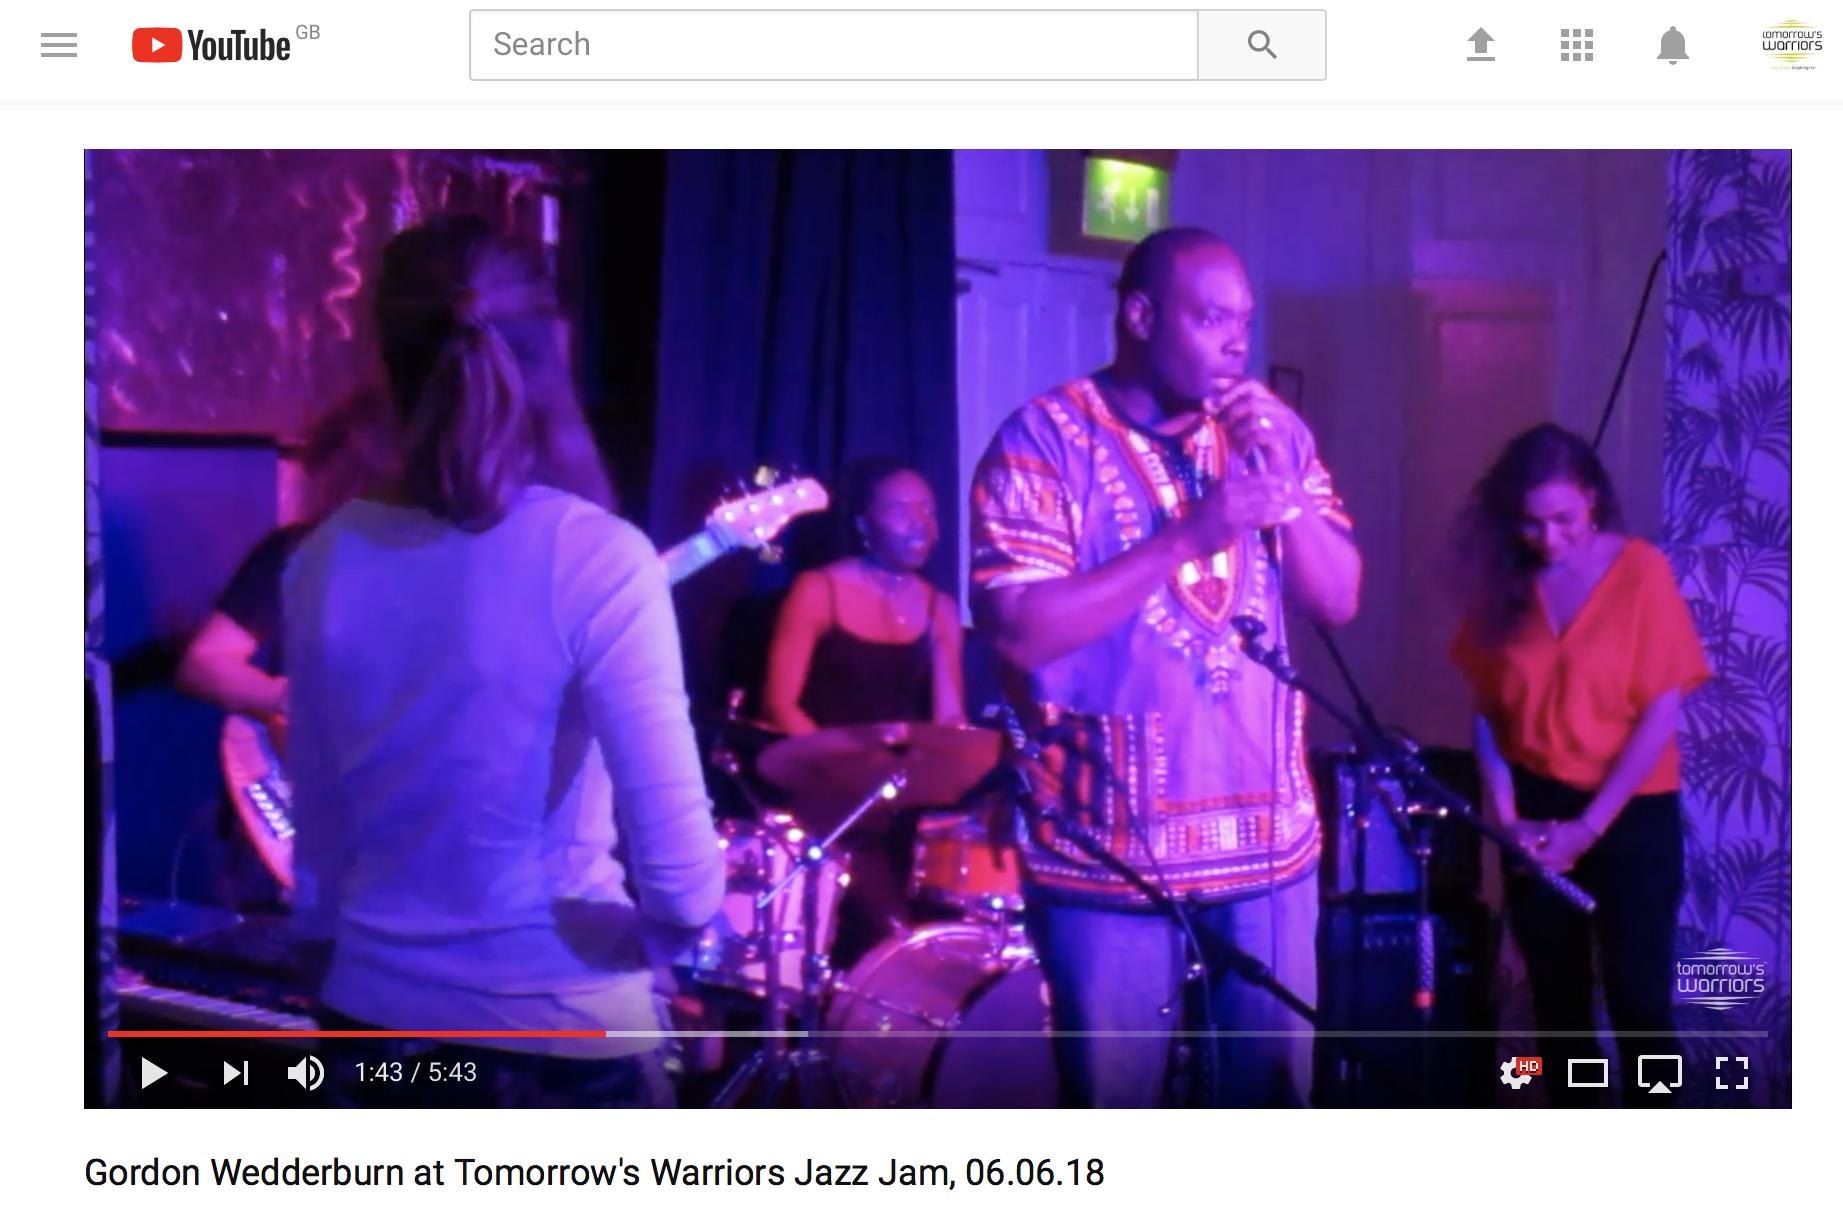 Youtube video of Gordon Wedderburn's speech at our jam